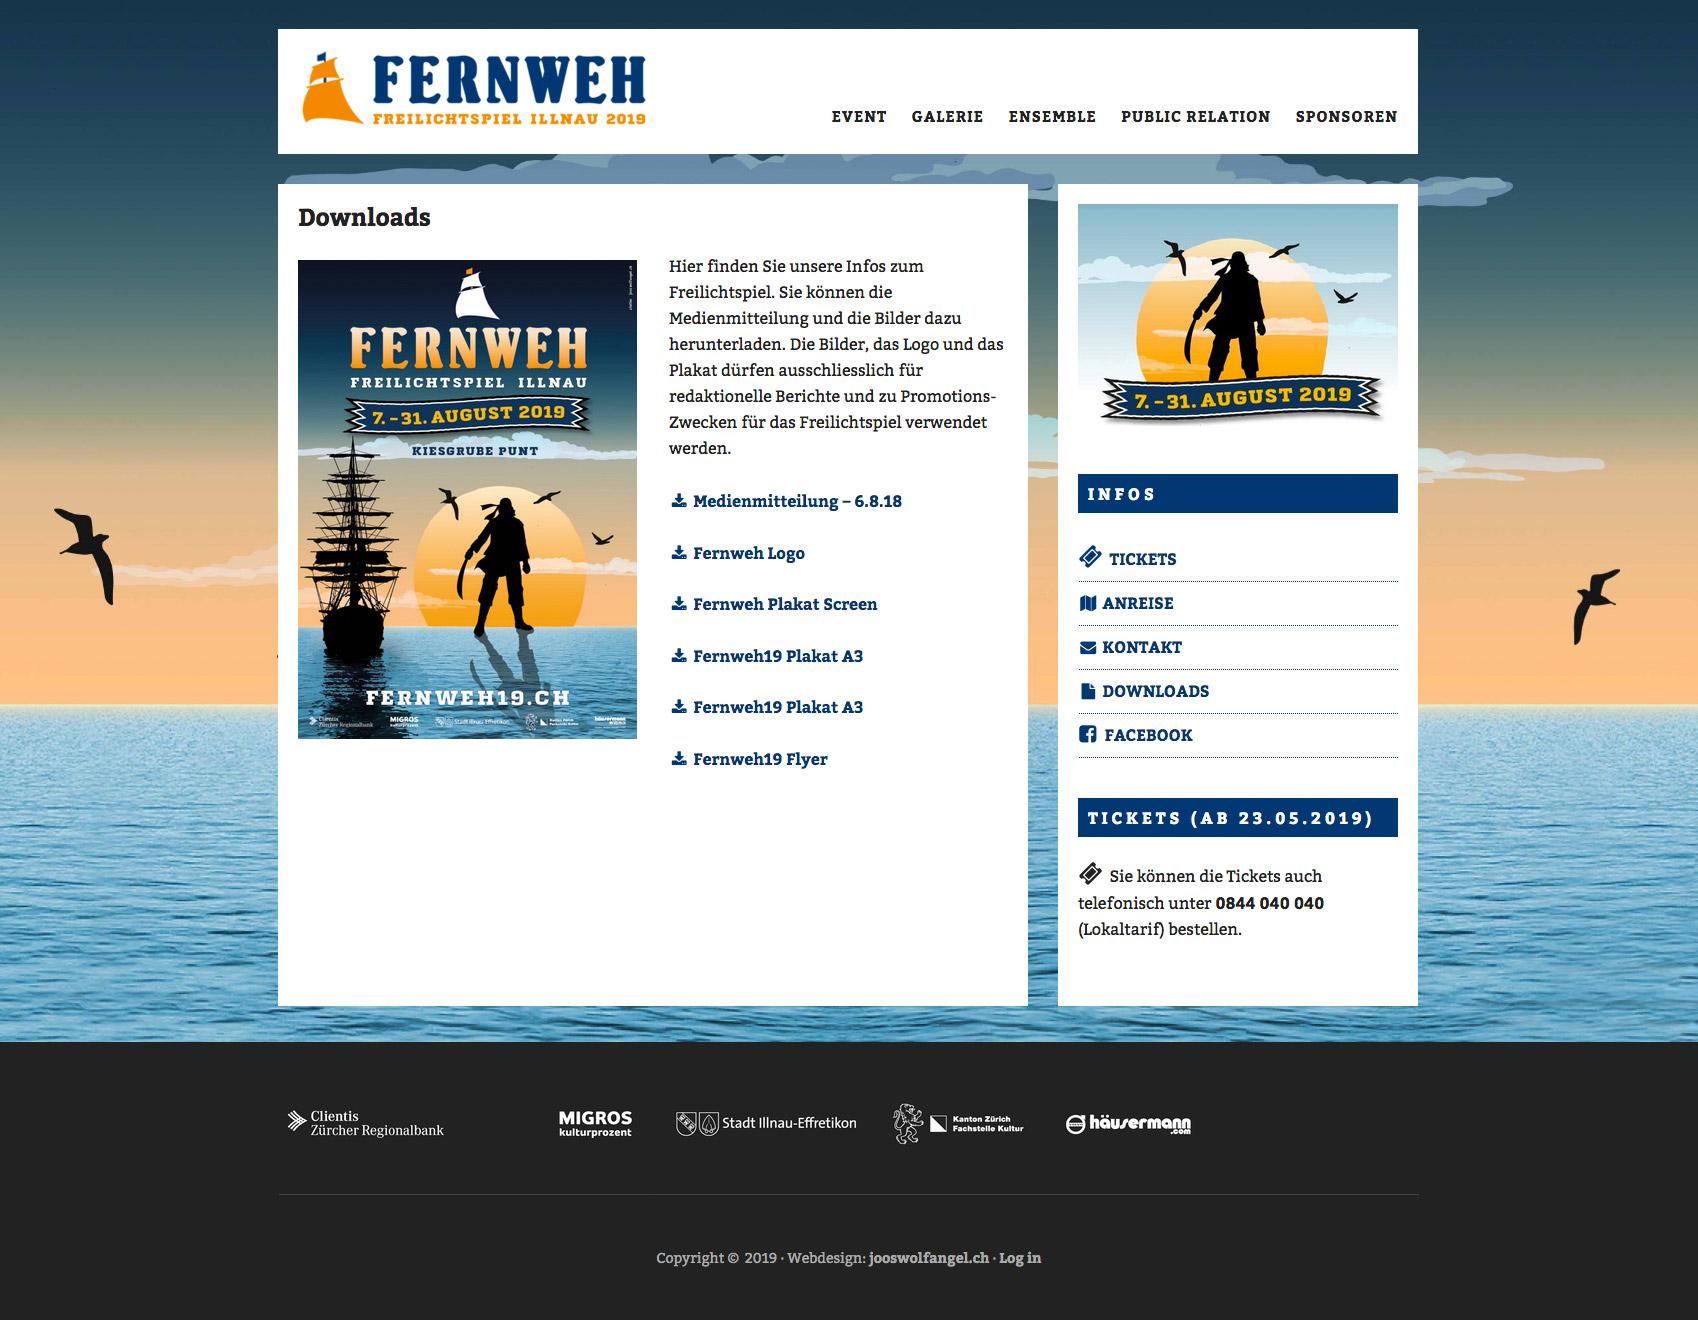 fernweh-presse.jpg